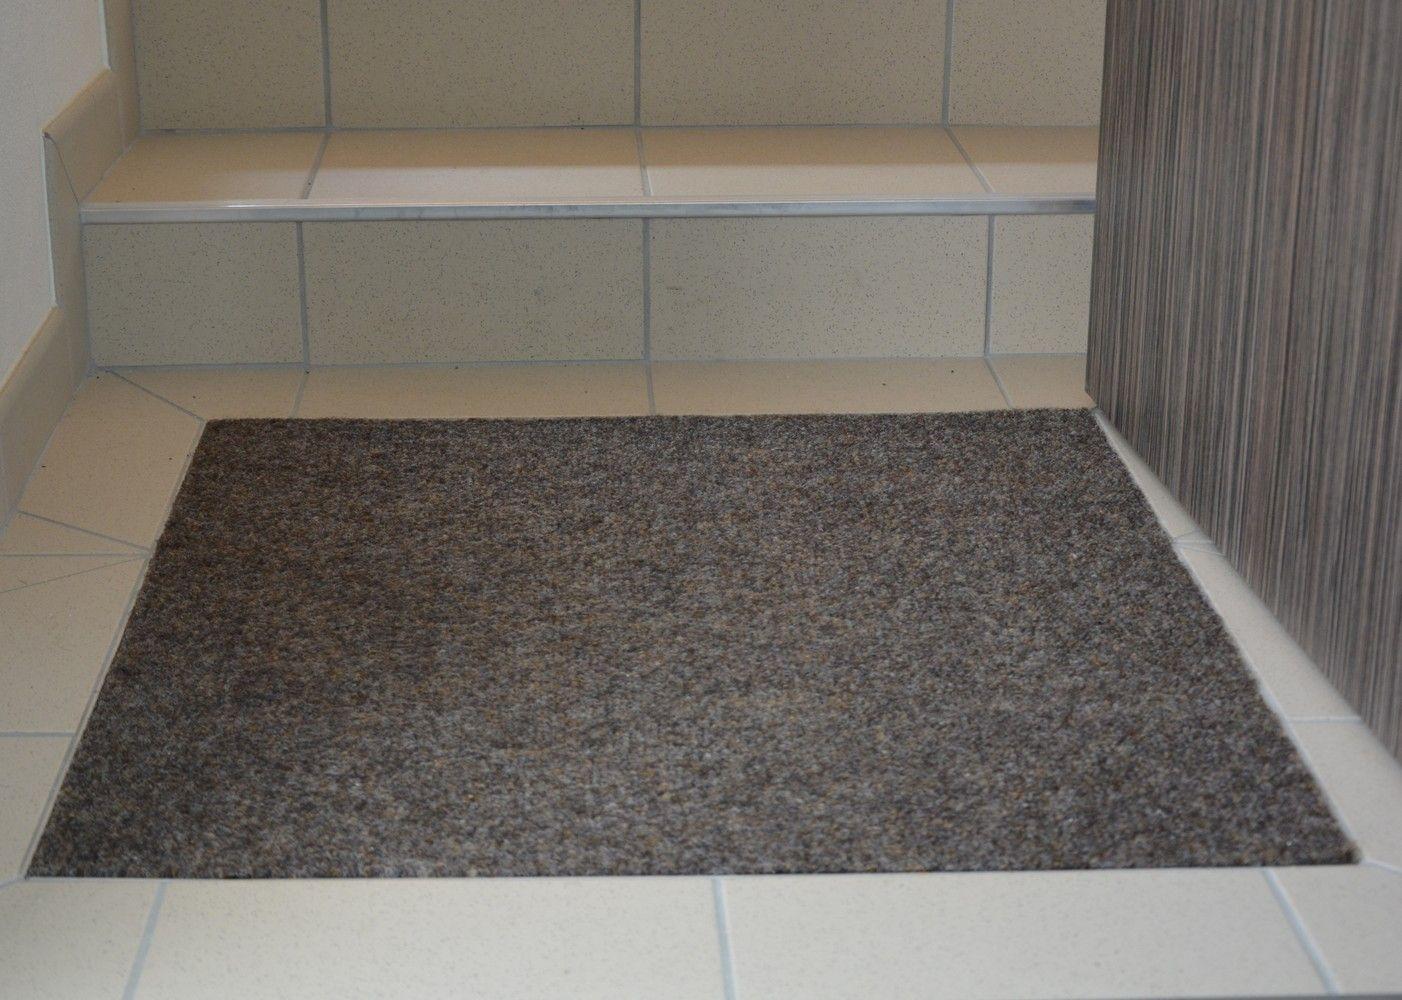 tapis brosse synth tique palcom sur mesure. Black Bedroom Furniture Sets. Home Design Ideas